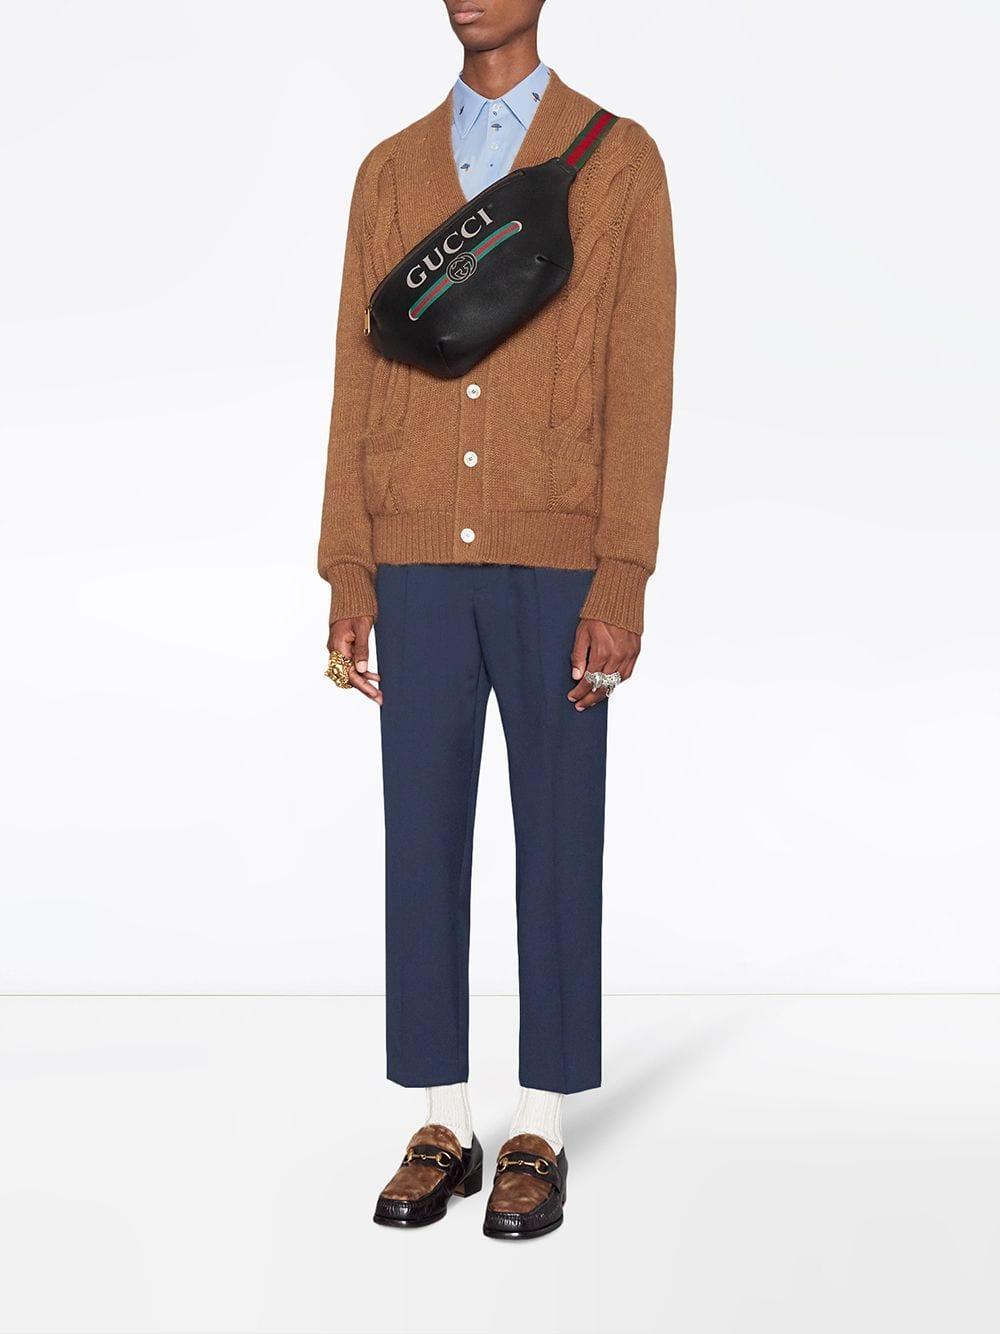 127043ffa64 Lyst - Gucci Black Print Leather Belt Bag in Black for Men